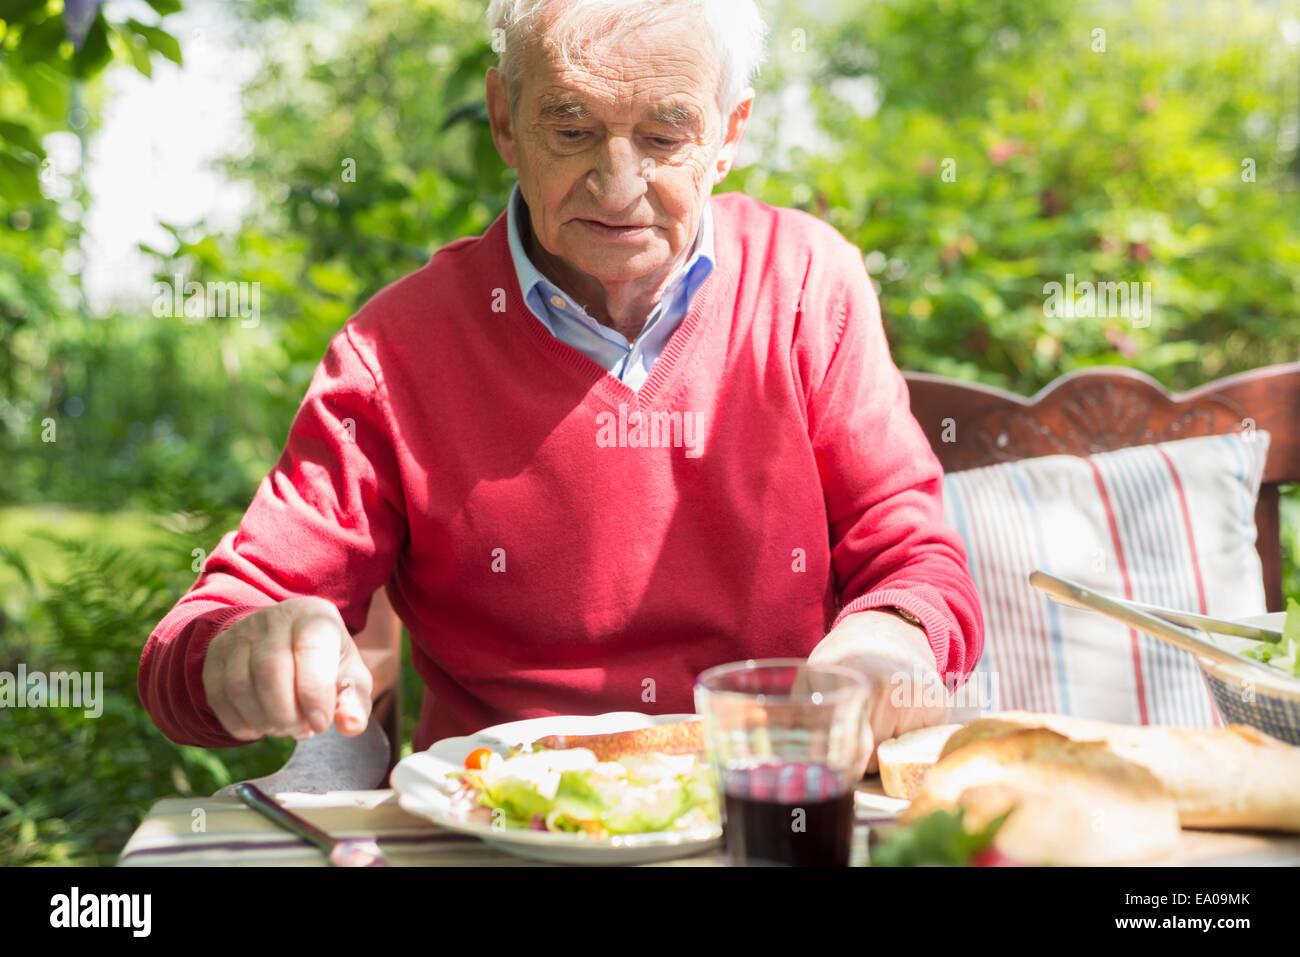 Hombre Senior almorzando al aire libre Imagen De Stock